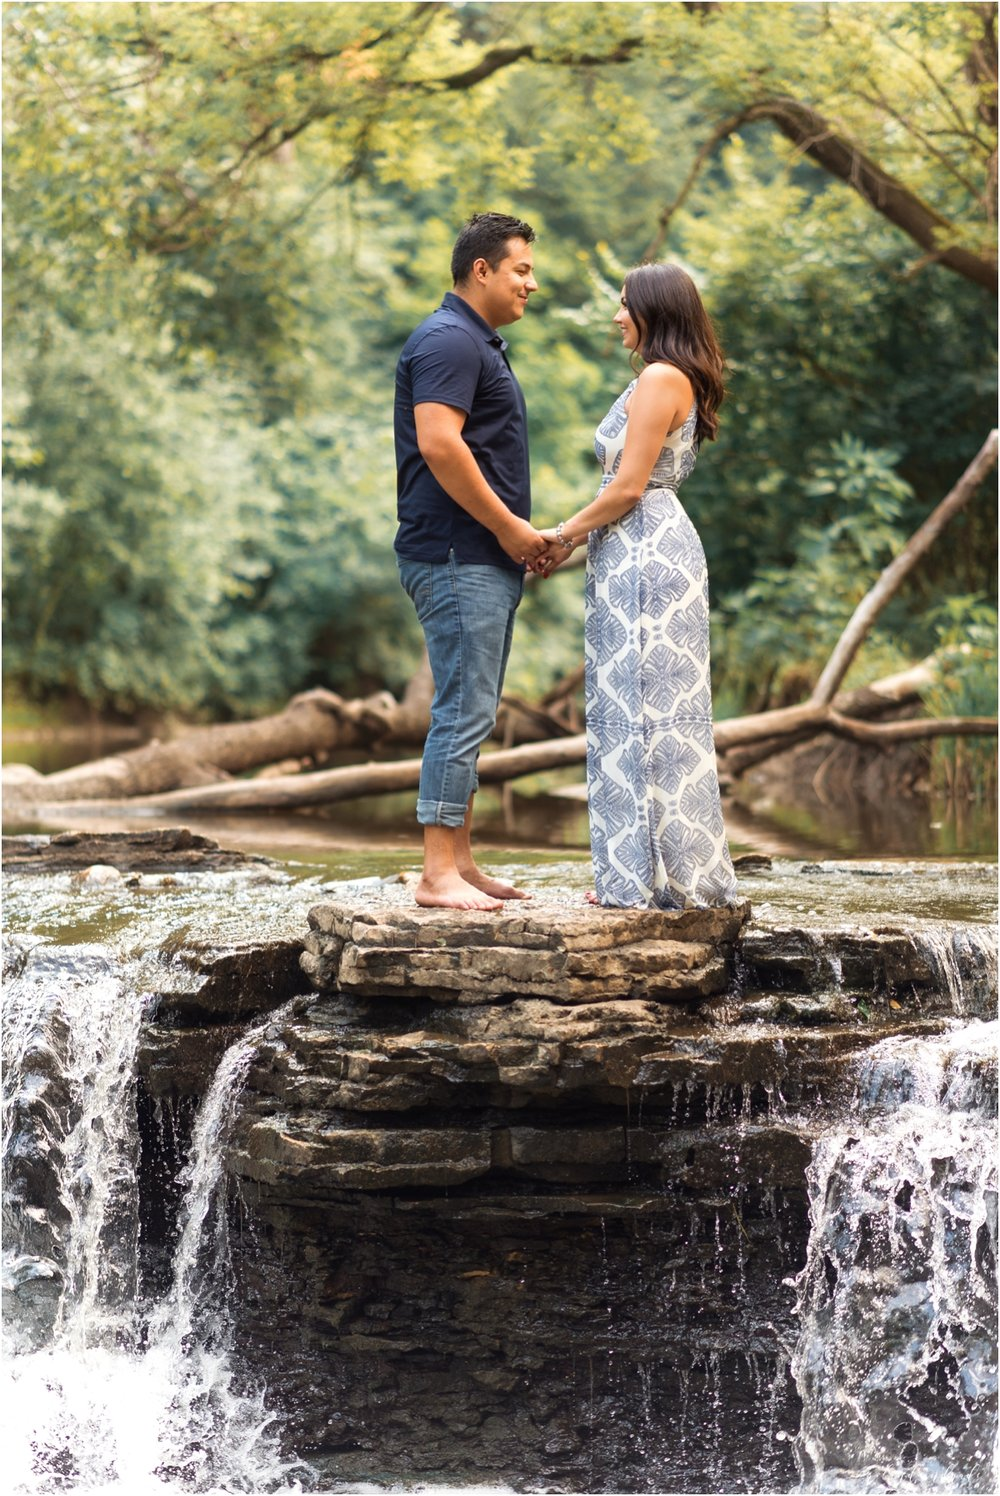 Waterfall Glenn Engagement Session, Lemont Illinois Engagement Session, Chicago Wedding Photographer, Naperville Wedding Photographer, Aurora Wedding Photographer28.jpg